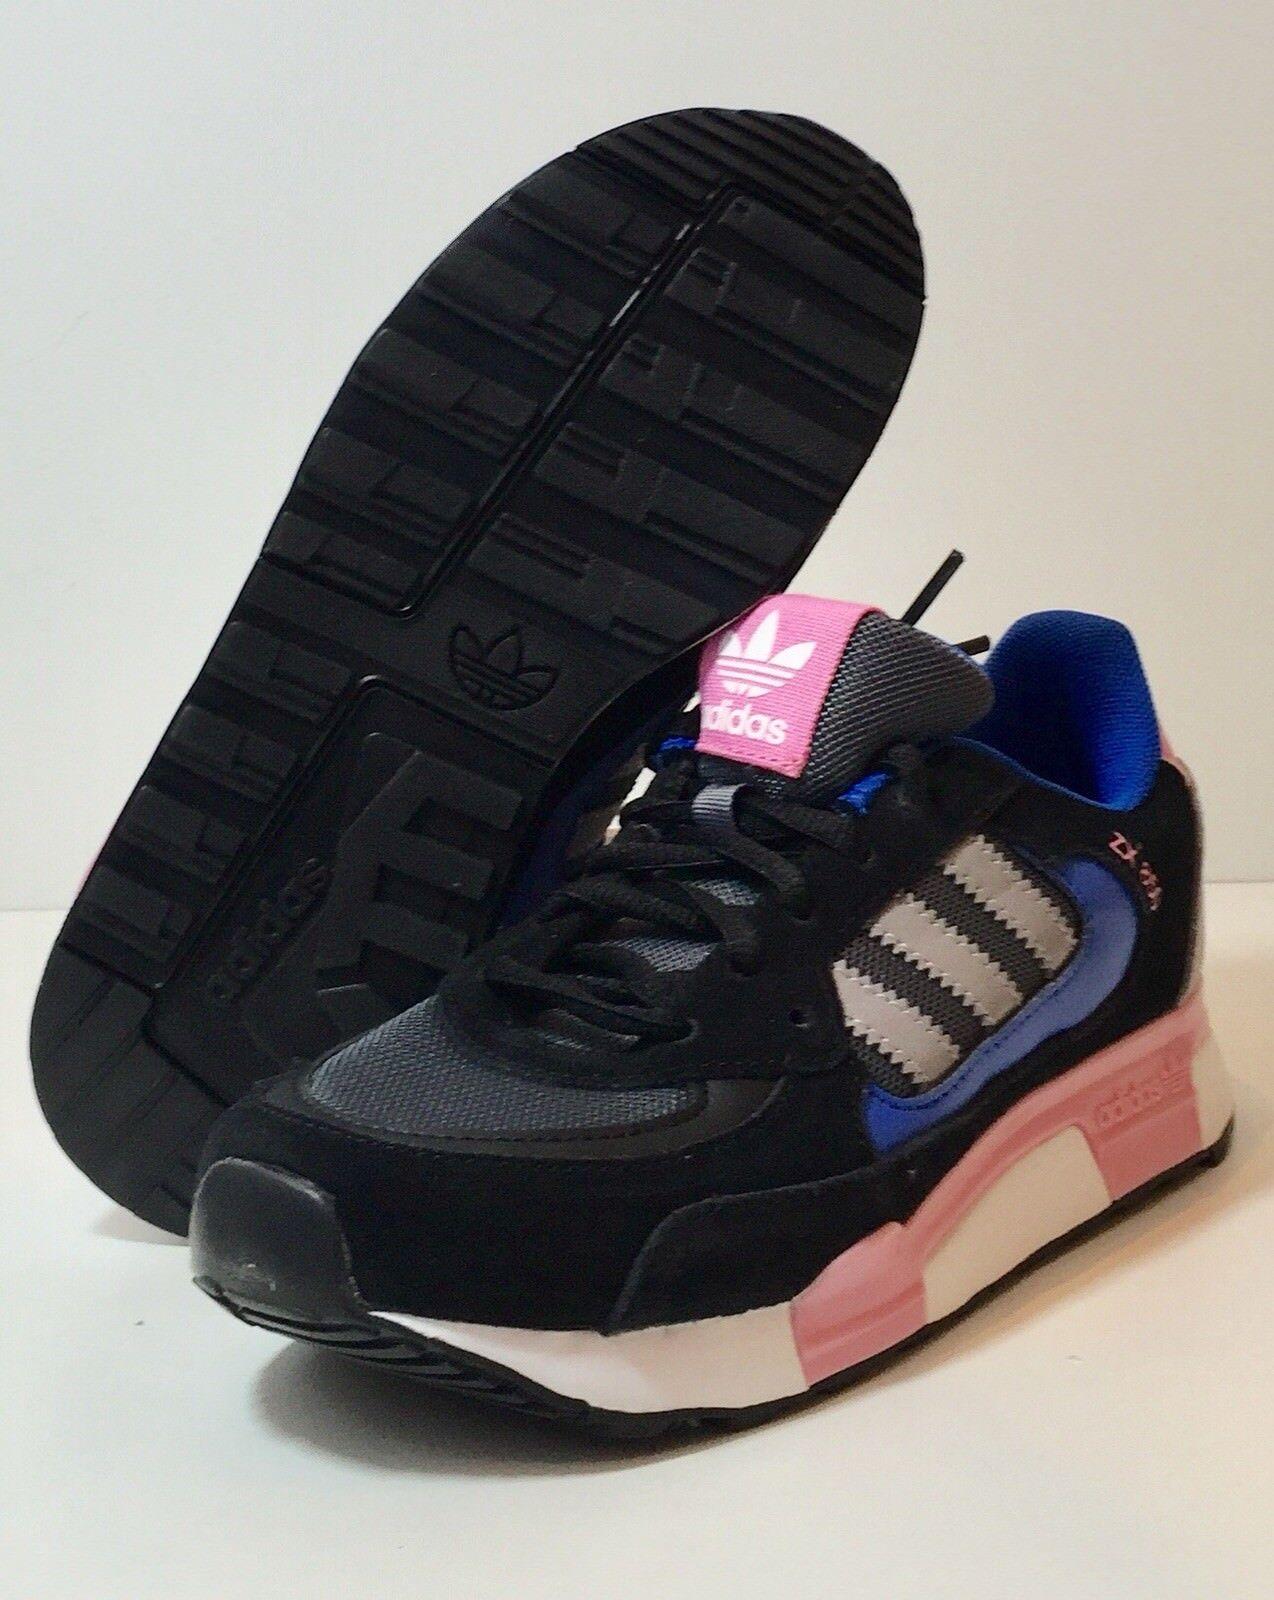 Adidas Originals ZX 850 W Damen Sneaker Schuh (37 - schwarz/pink - M20905 (37 Schuh 1/3) 54d50c